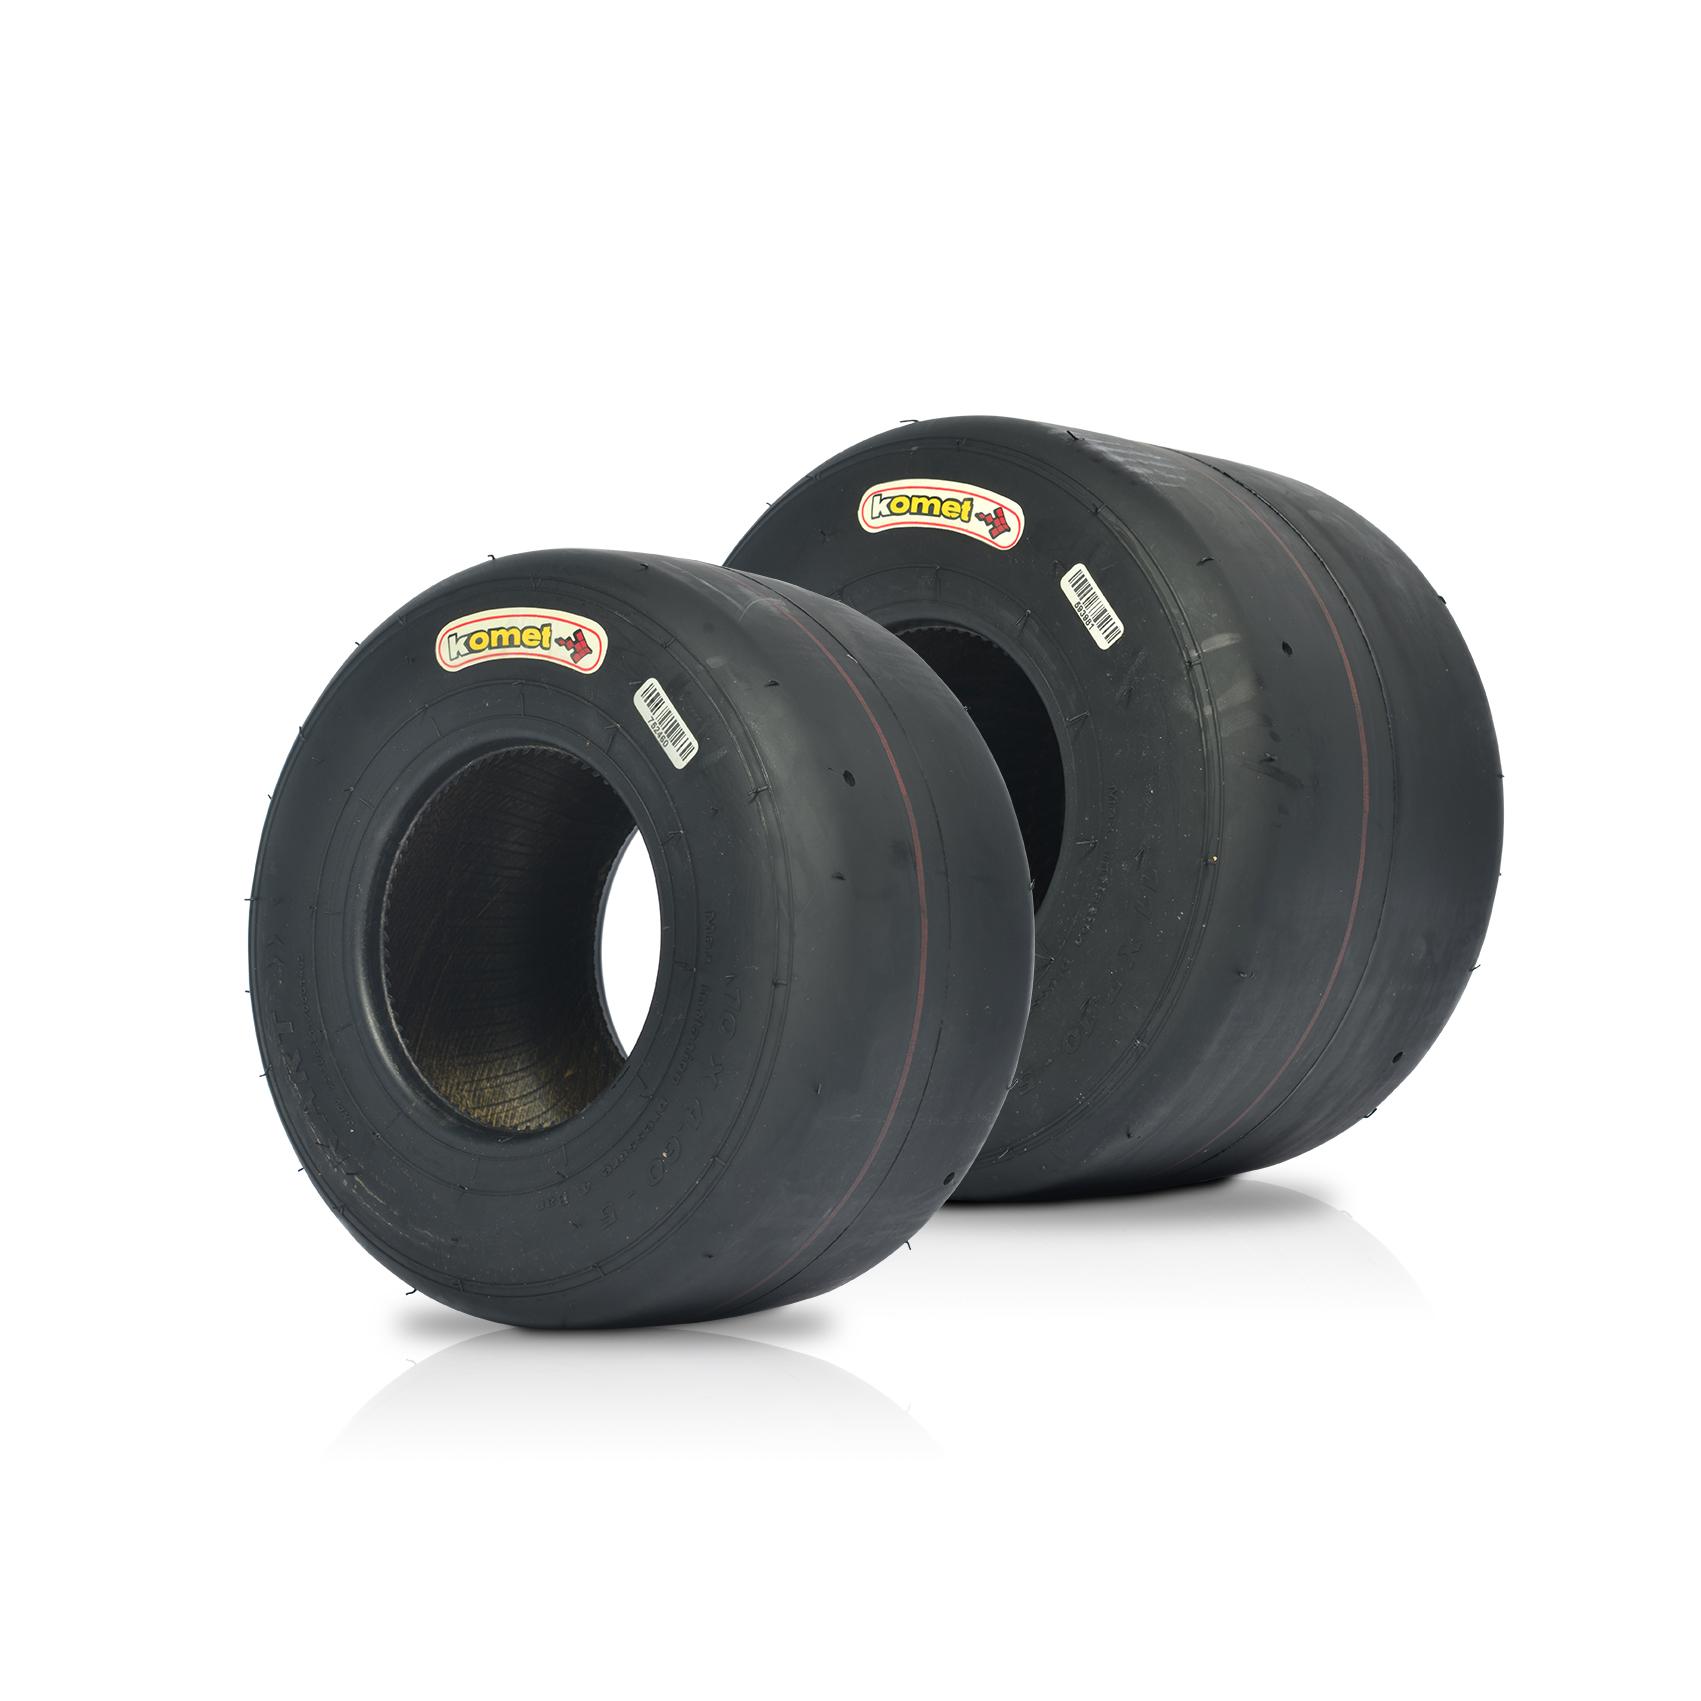 IAME KARTING | Komet Racing Tyres k1H